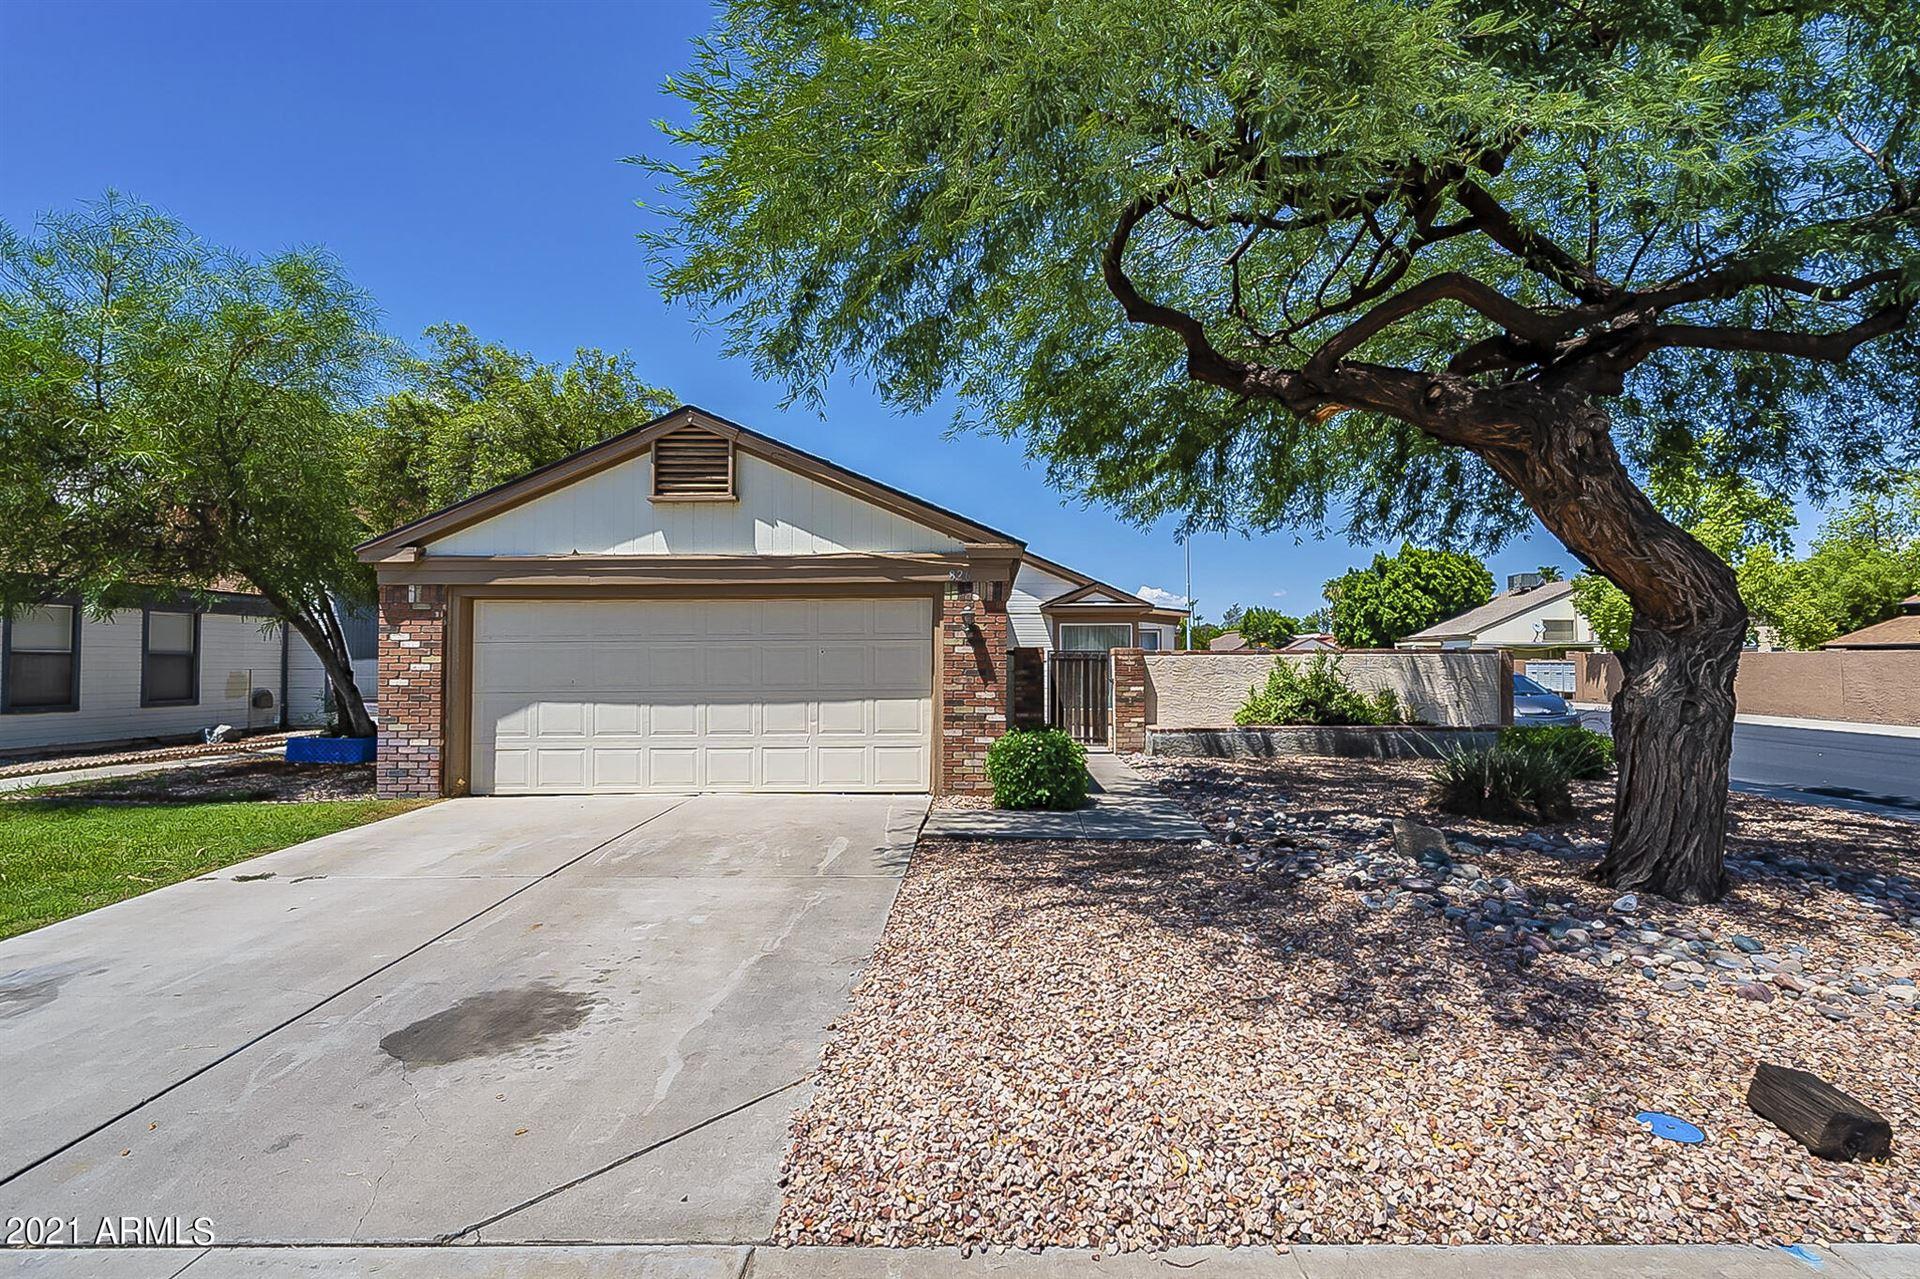 826 E MANOR Drive, Chandler, AZ 85225 - MLS#: 6270677